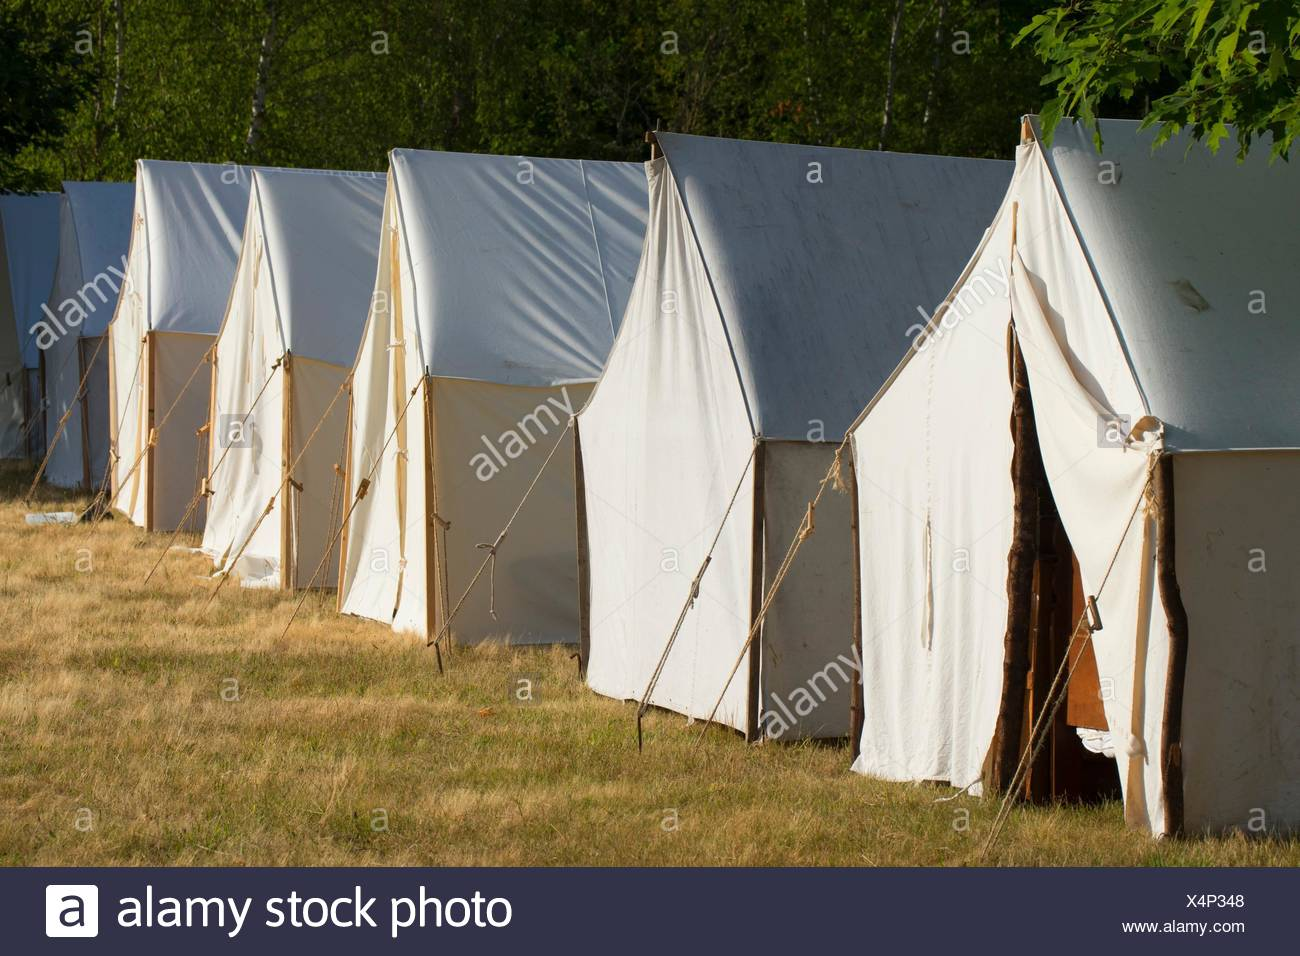 Camp tents, Civil War Re-enactment, Willamette Mission State Park, Oregon. - Stock Image